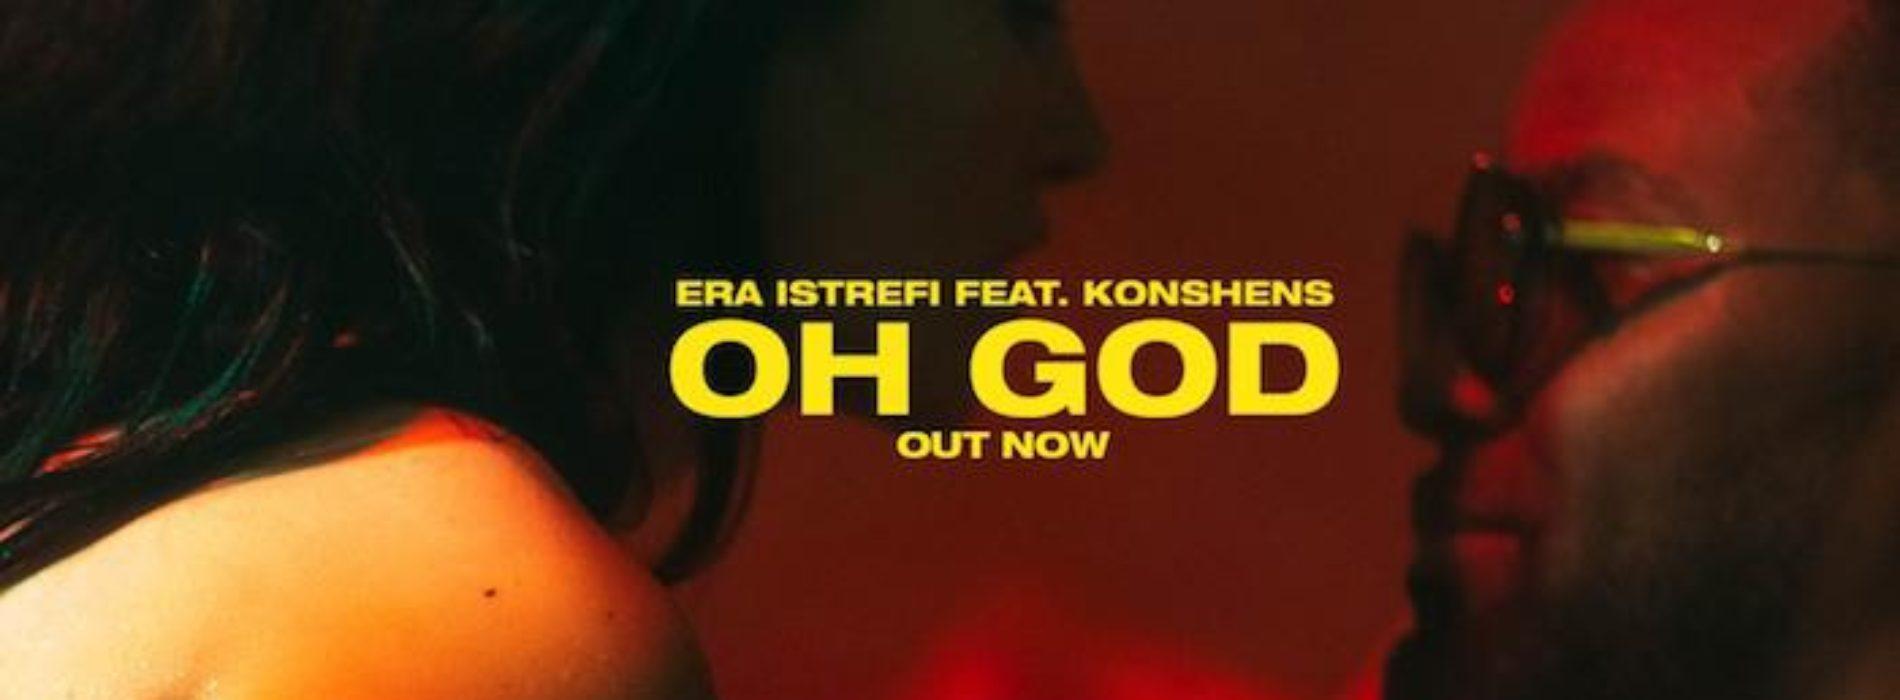 Era Istrefi feat. Konshens  – Oh God / Konshens – Summer Wine – starring COBOURINE – Août 2018